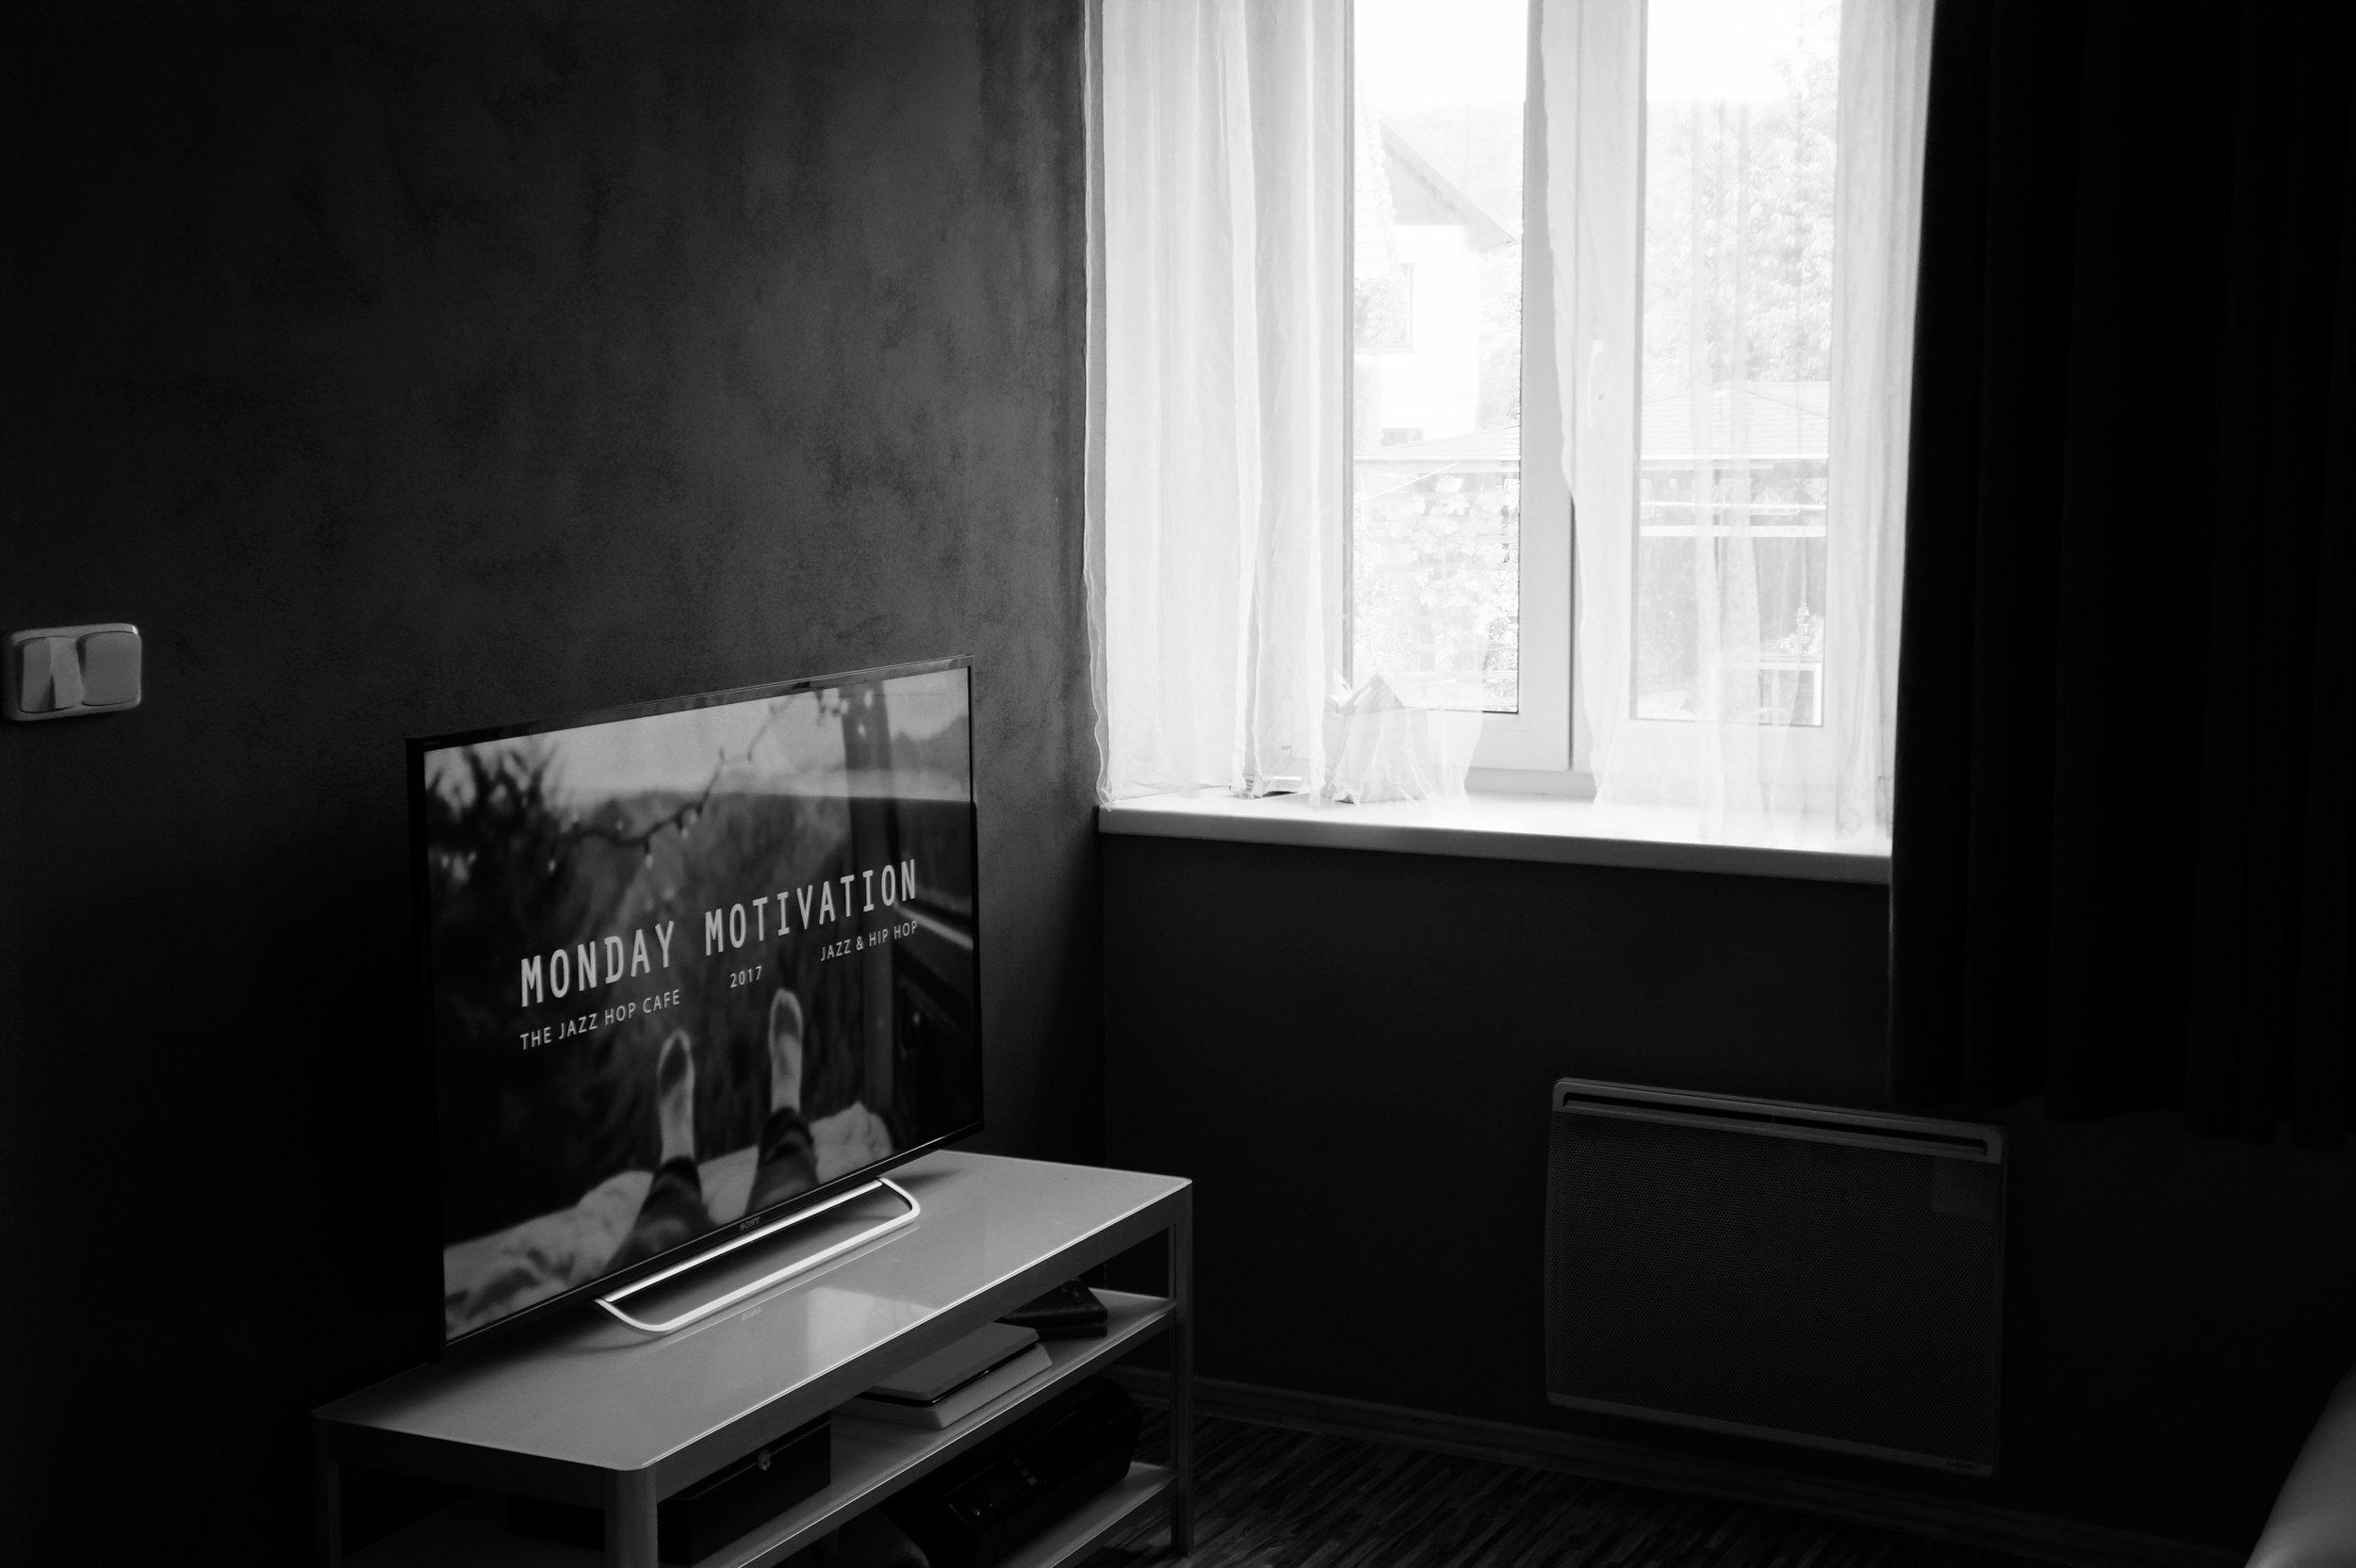 apartment-architecture-bedroom-670246.jpg